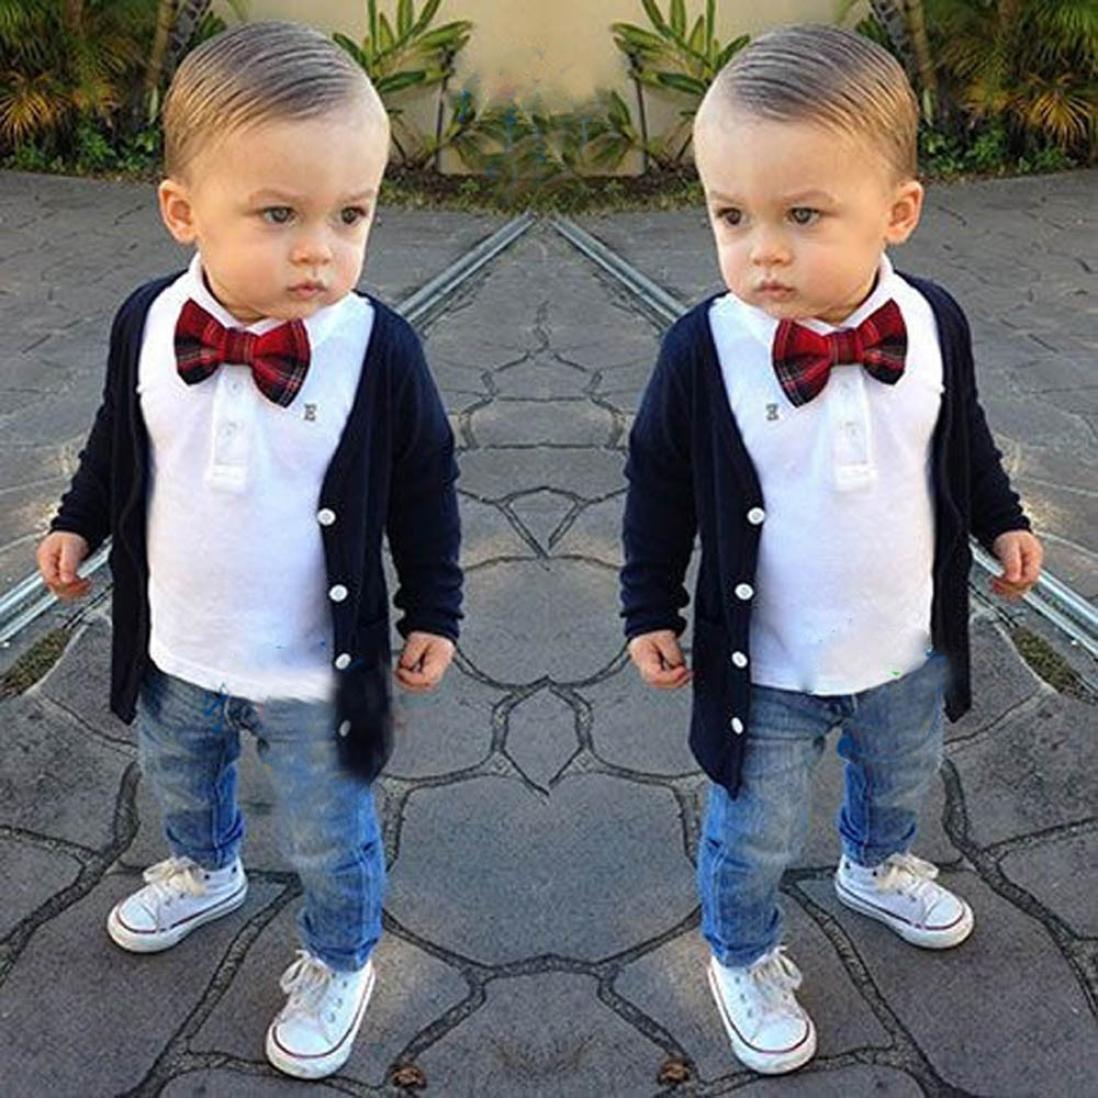 d90526252dcc Scaling❤ Fashion Baby Boy Outfits Summer Gentleman Bow Tie T Shirt  Tops+Jeans Long Pant+Coat 3pcs Clothes Set